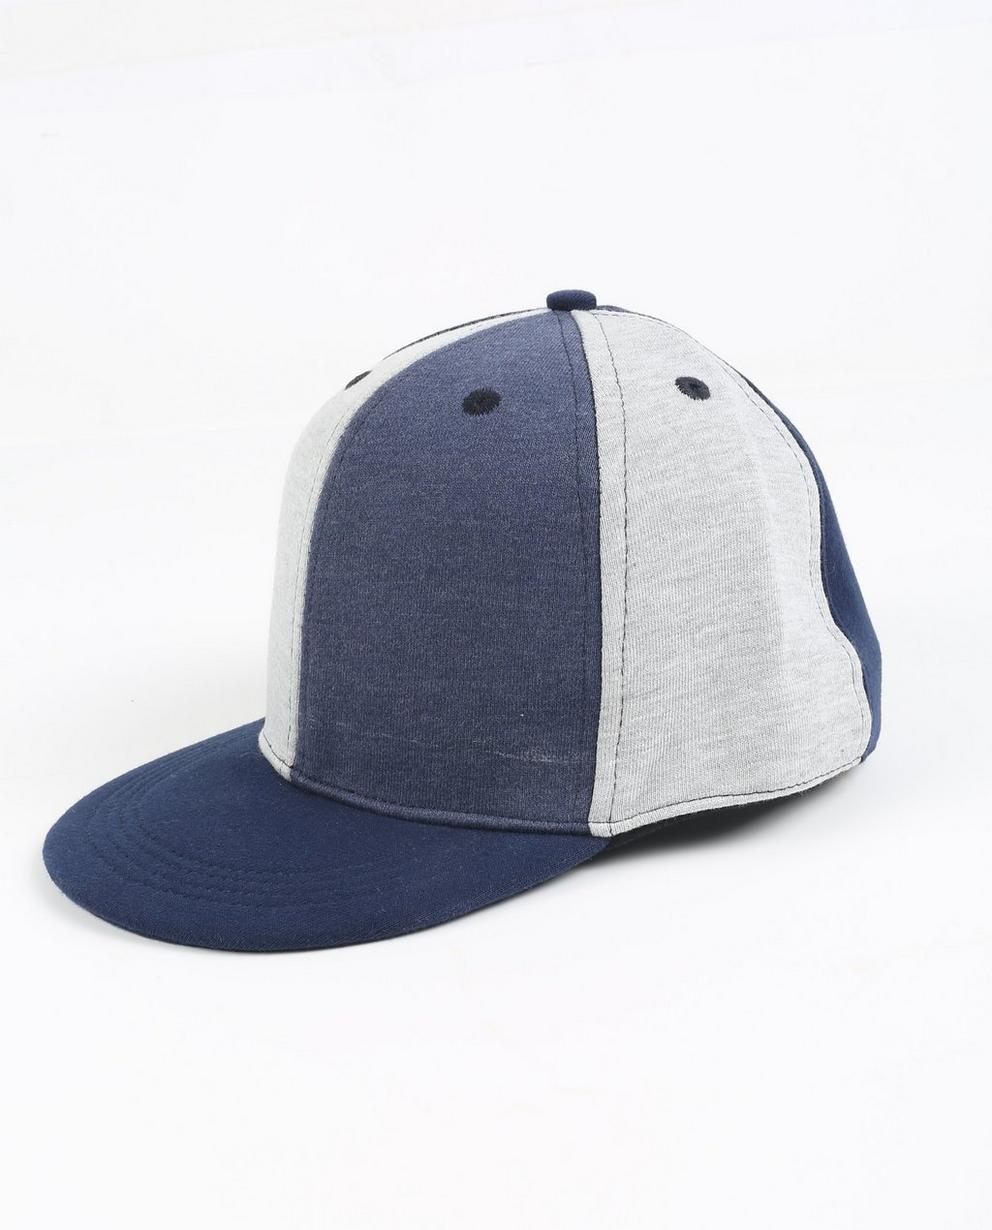 Dunkelblau-graue Mütze - Rox - Rox